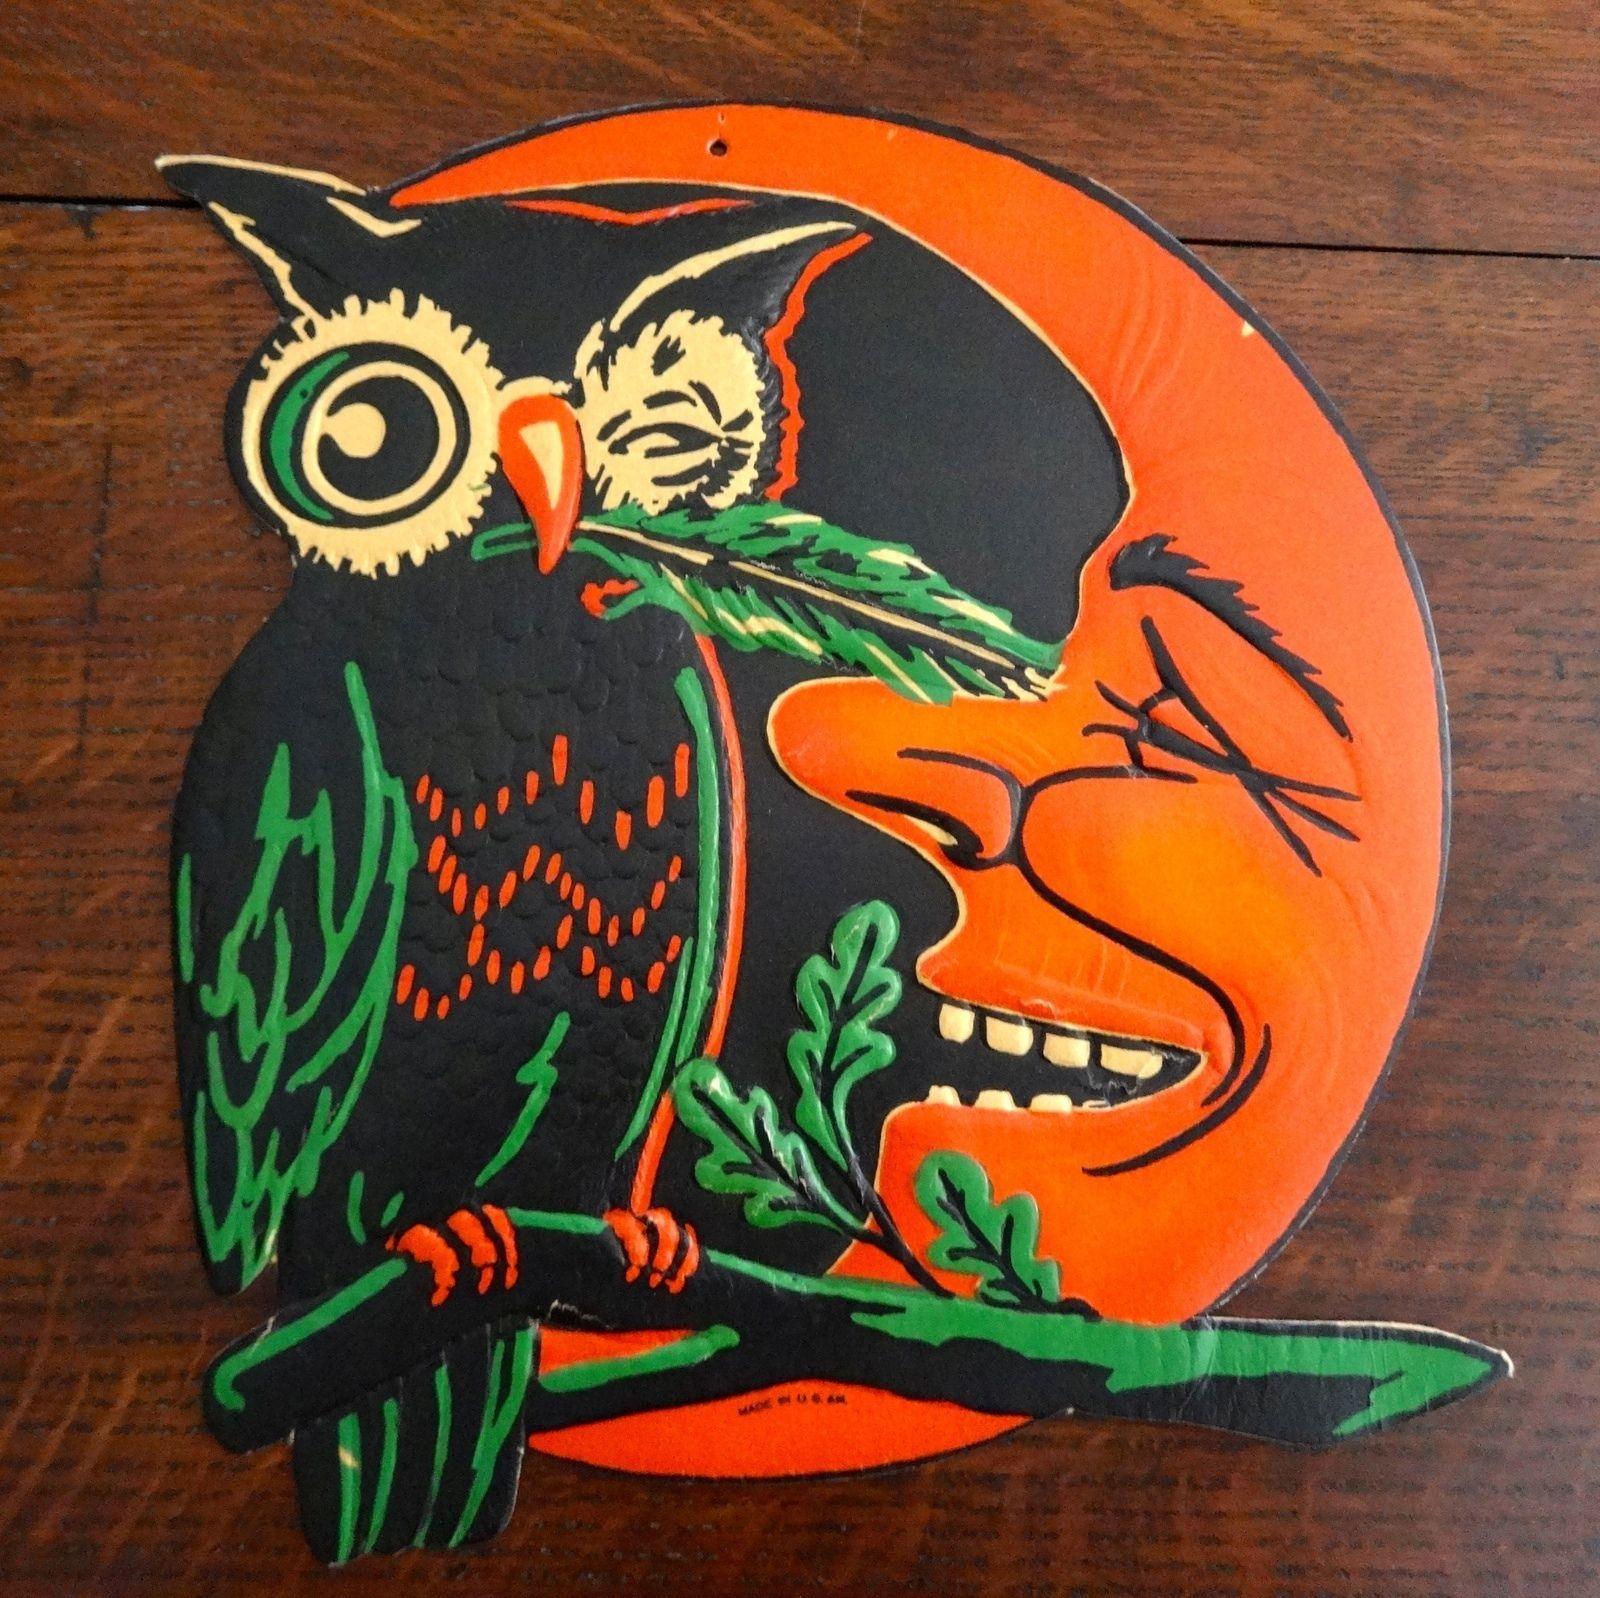 vintage 1930s halloween diecut winking owl moon beistle usa decoration ebay - Beistle Halloween Decorations